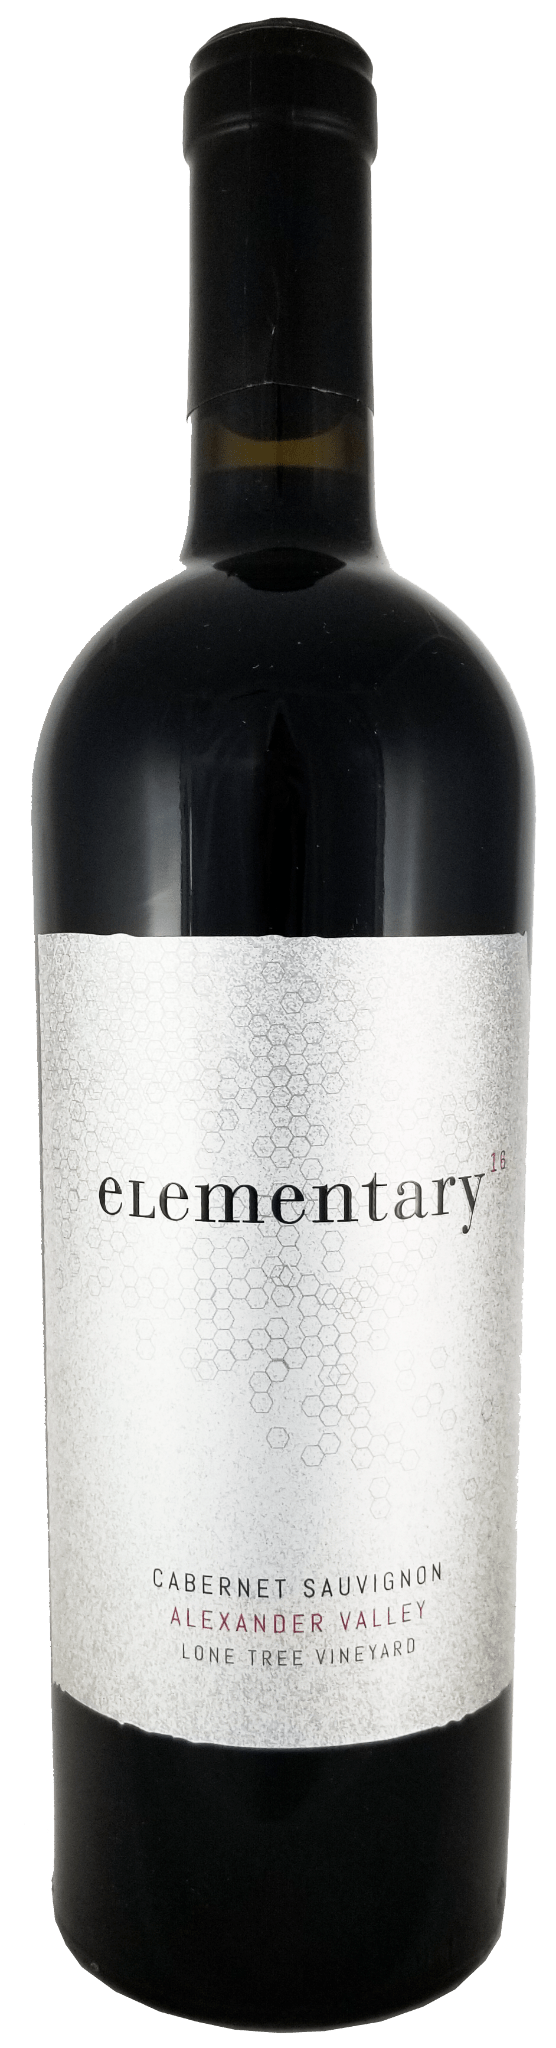 goldschmidt-elementary-cabernet-sauvignon-1-1-1